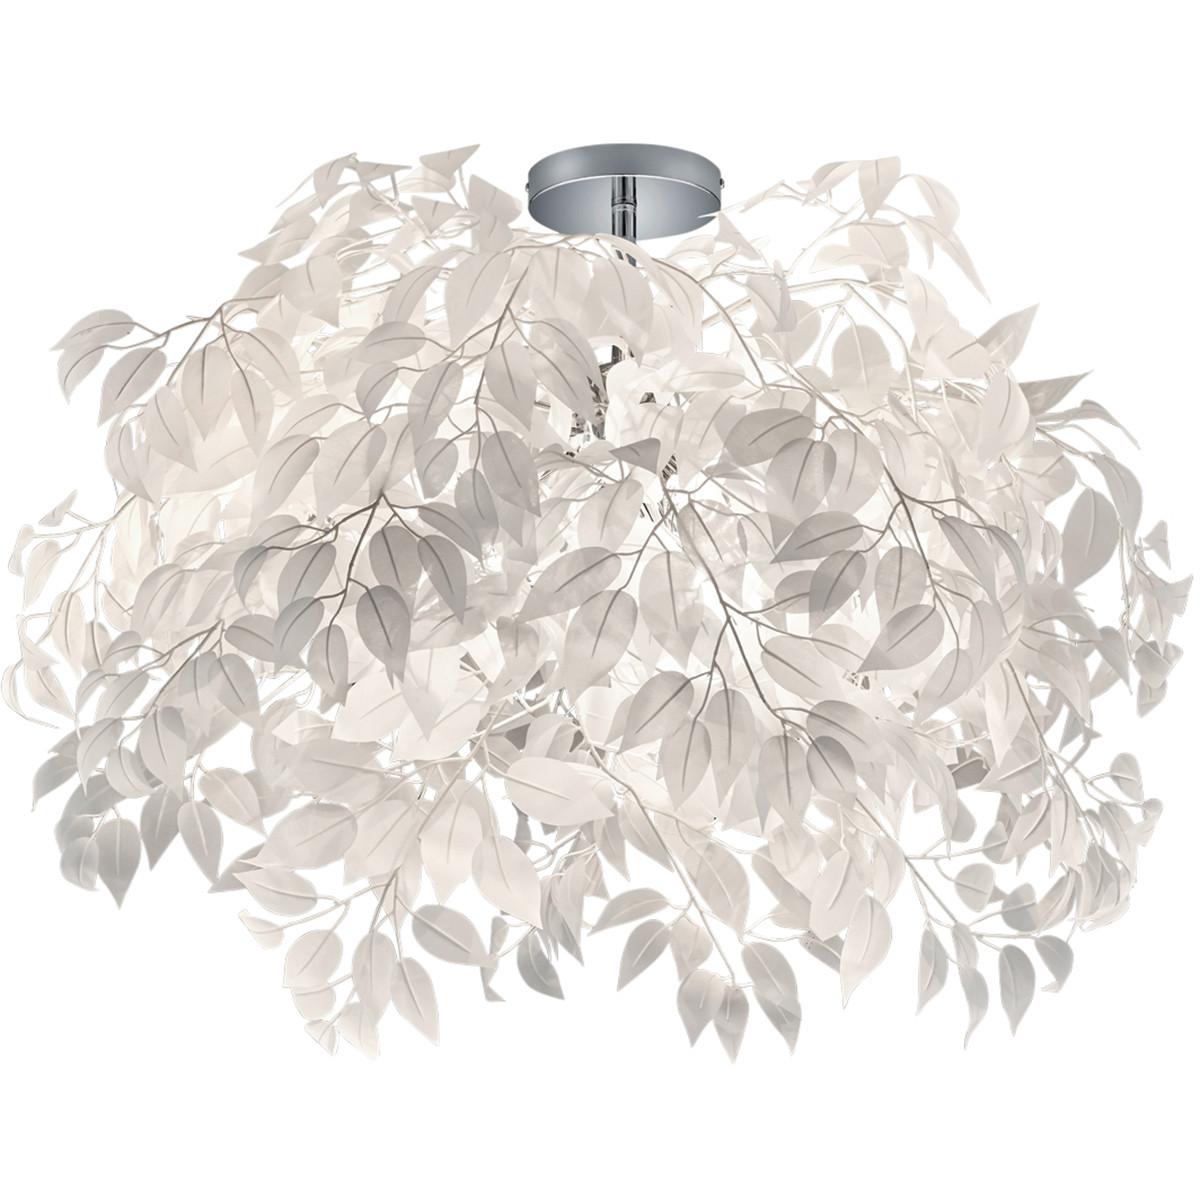 LED Plafondlamp - Plafondverlichting - Trion Lovy - E14 Fitting - 3-lichts - Rond - Glans Chroom Alu